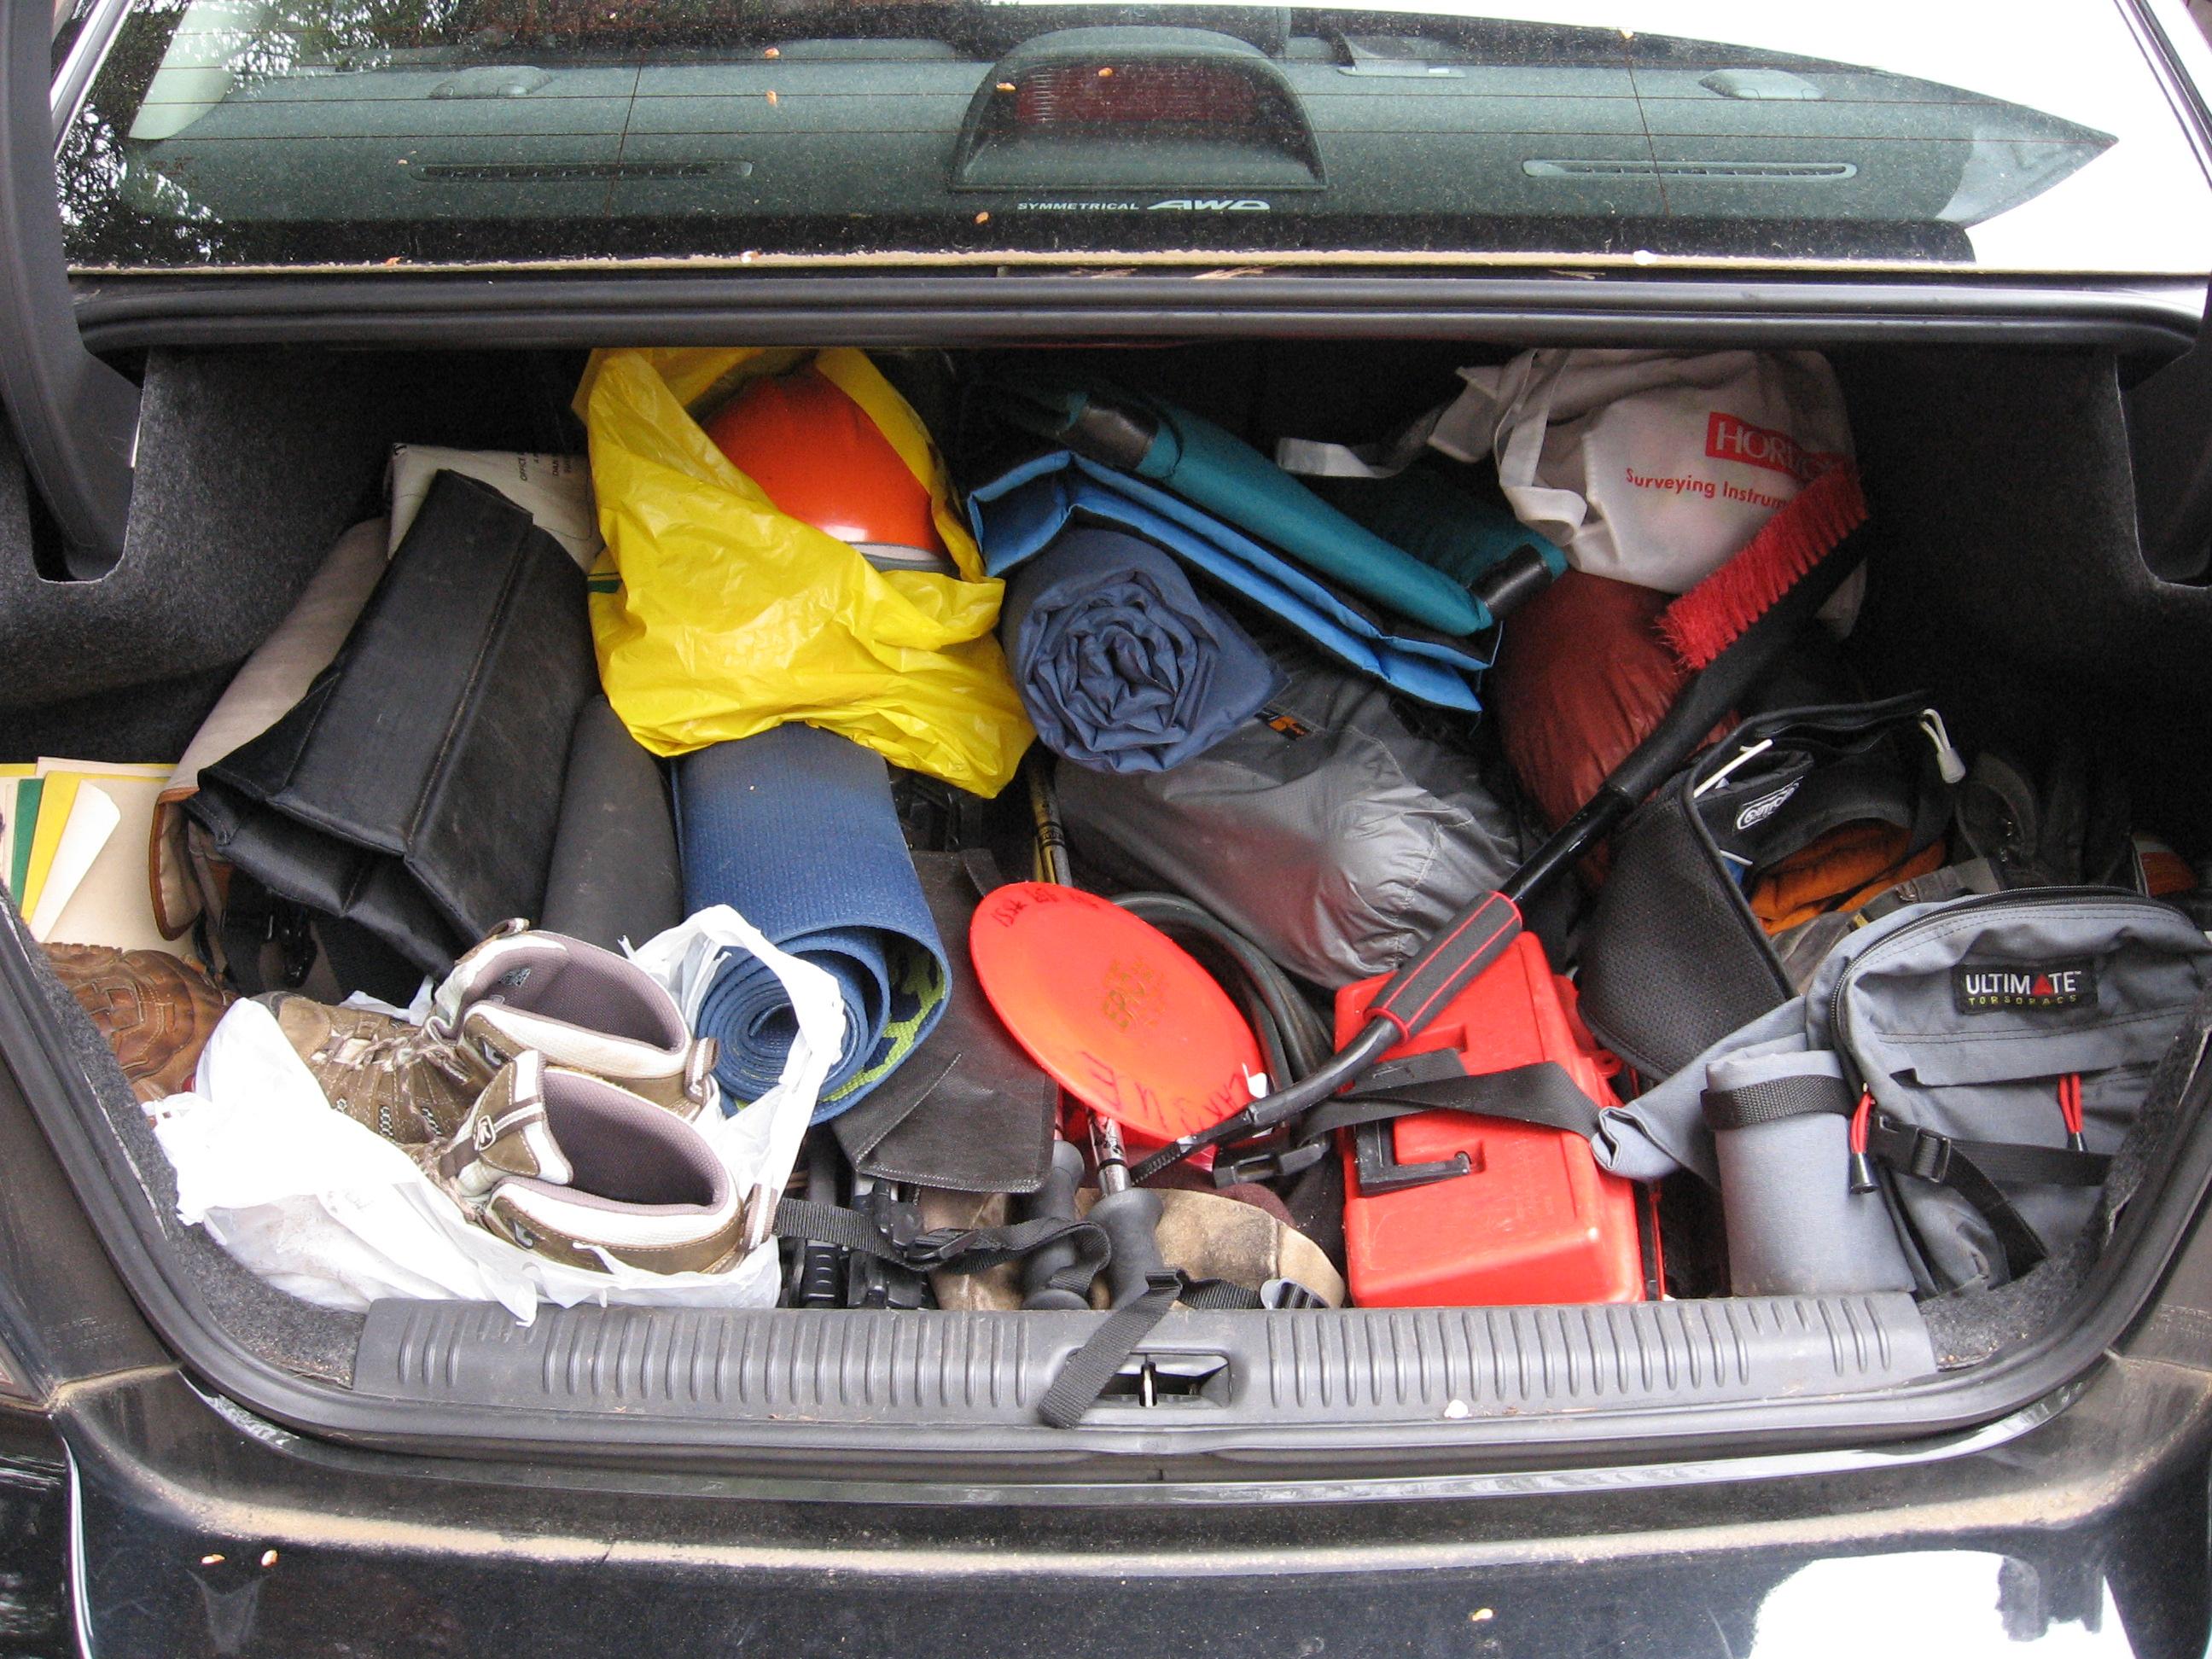 junk in trunk  Happyasalarques Blog